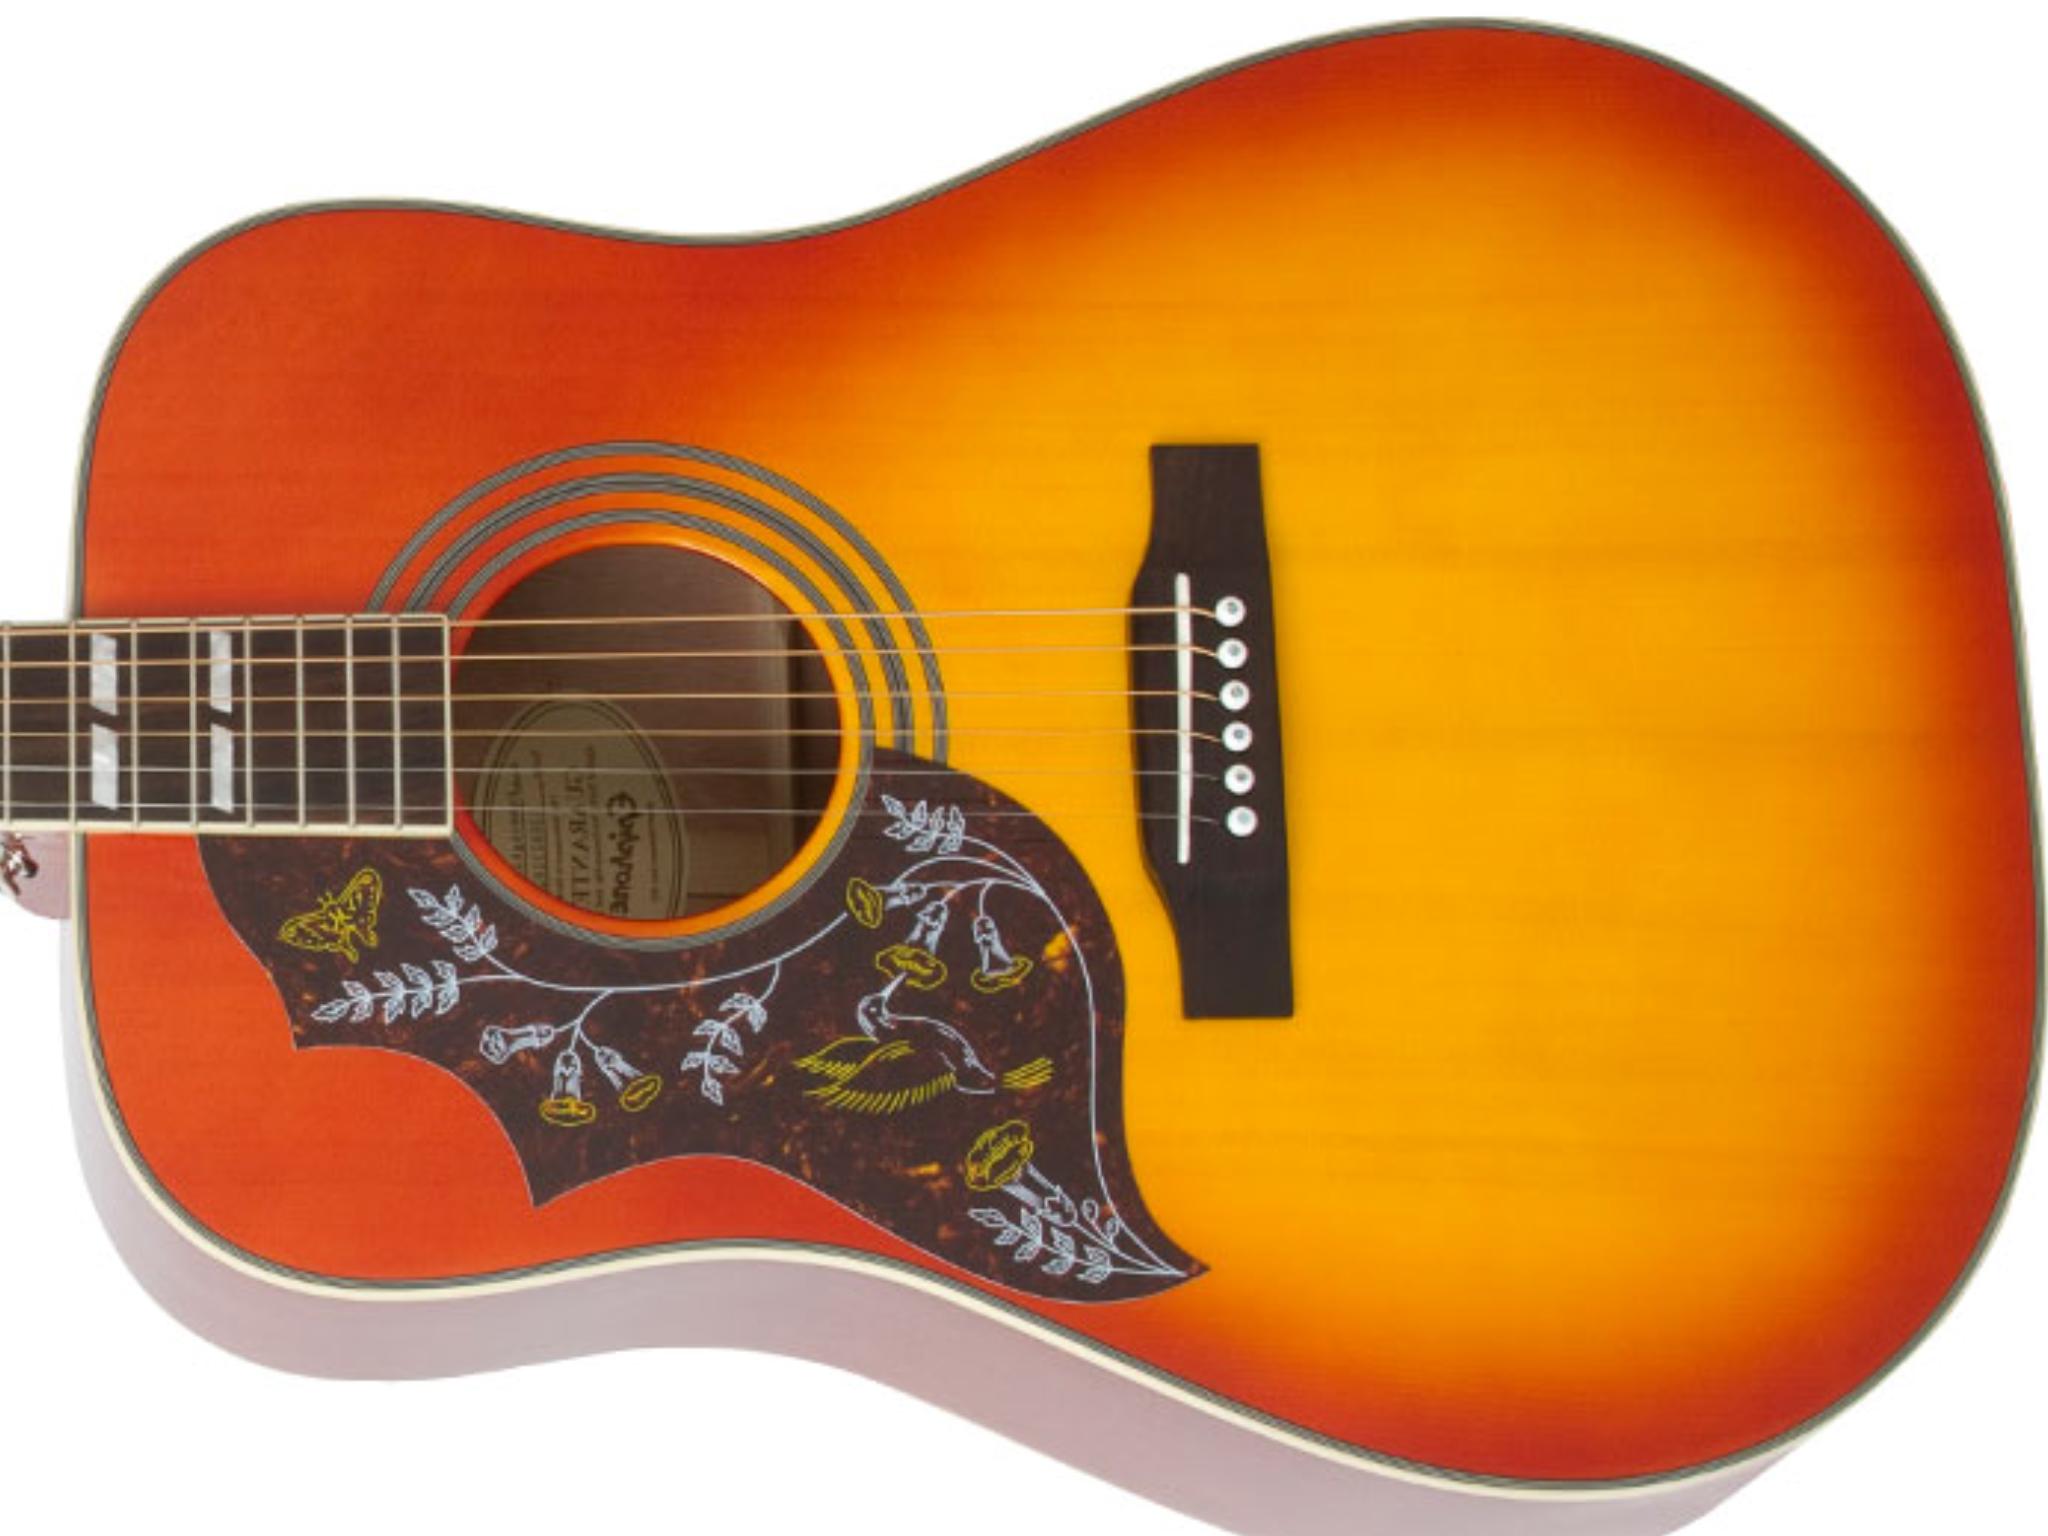 Epiphone Hummingbird Left Handed Guitar Left Handed Lefty Guitars